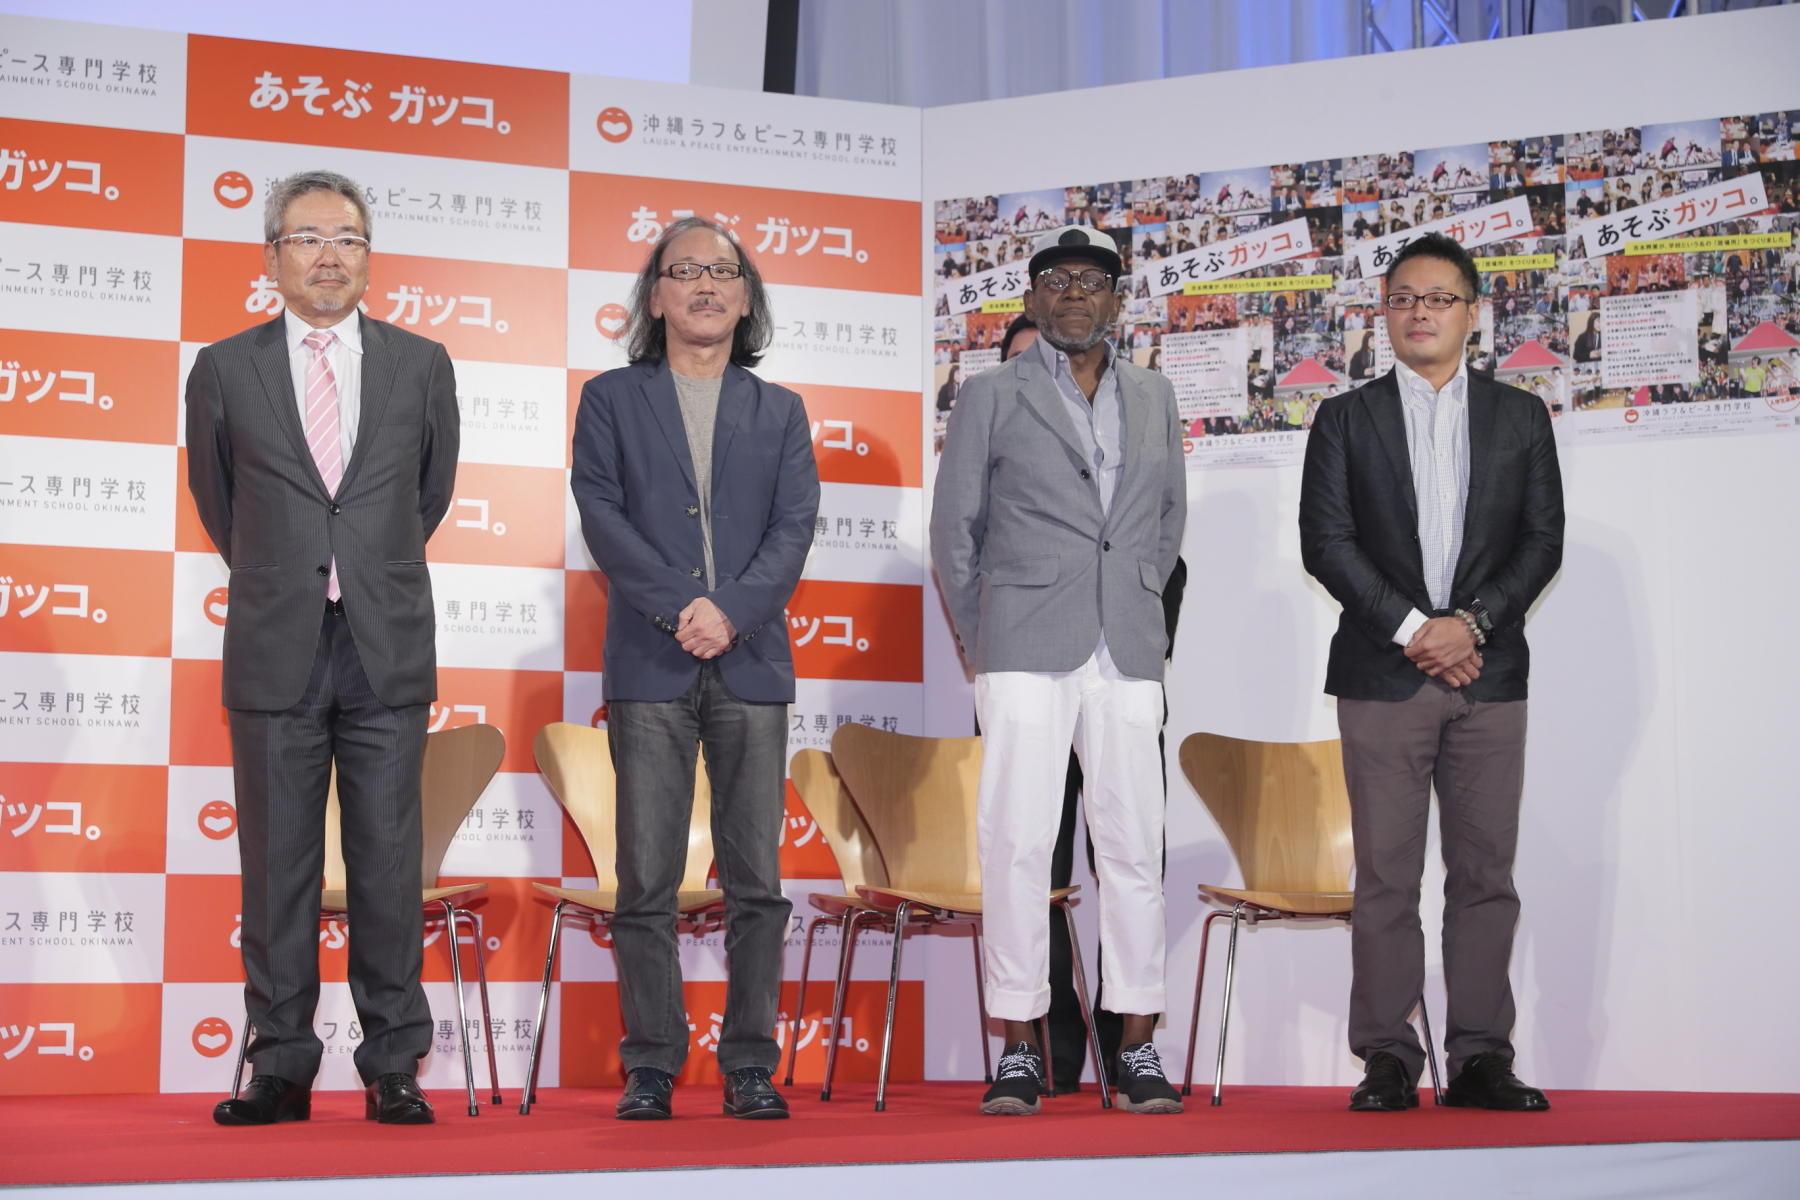 http://news.yoshimoto.co.jp/20171006102208-10e03766e707ab4e3dd8cb8a1f6355223fb3e784.jpg